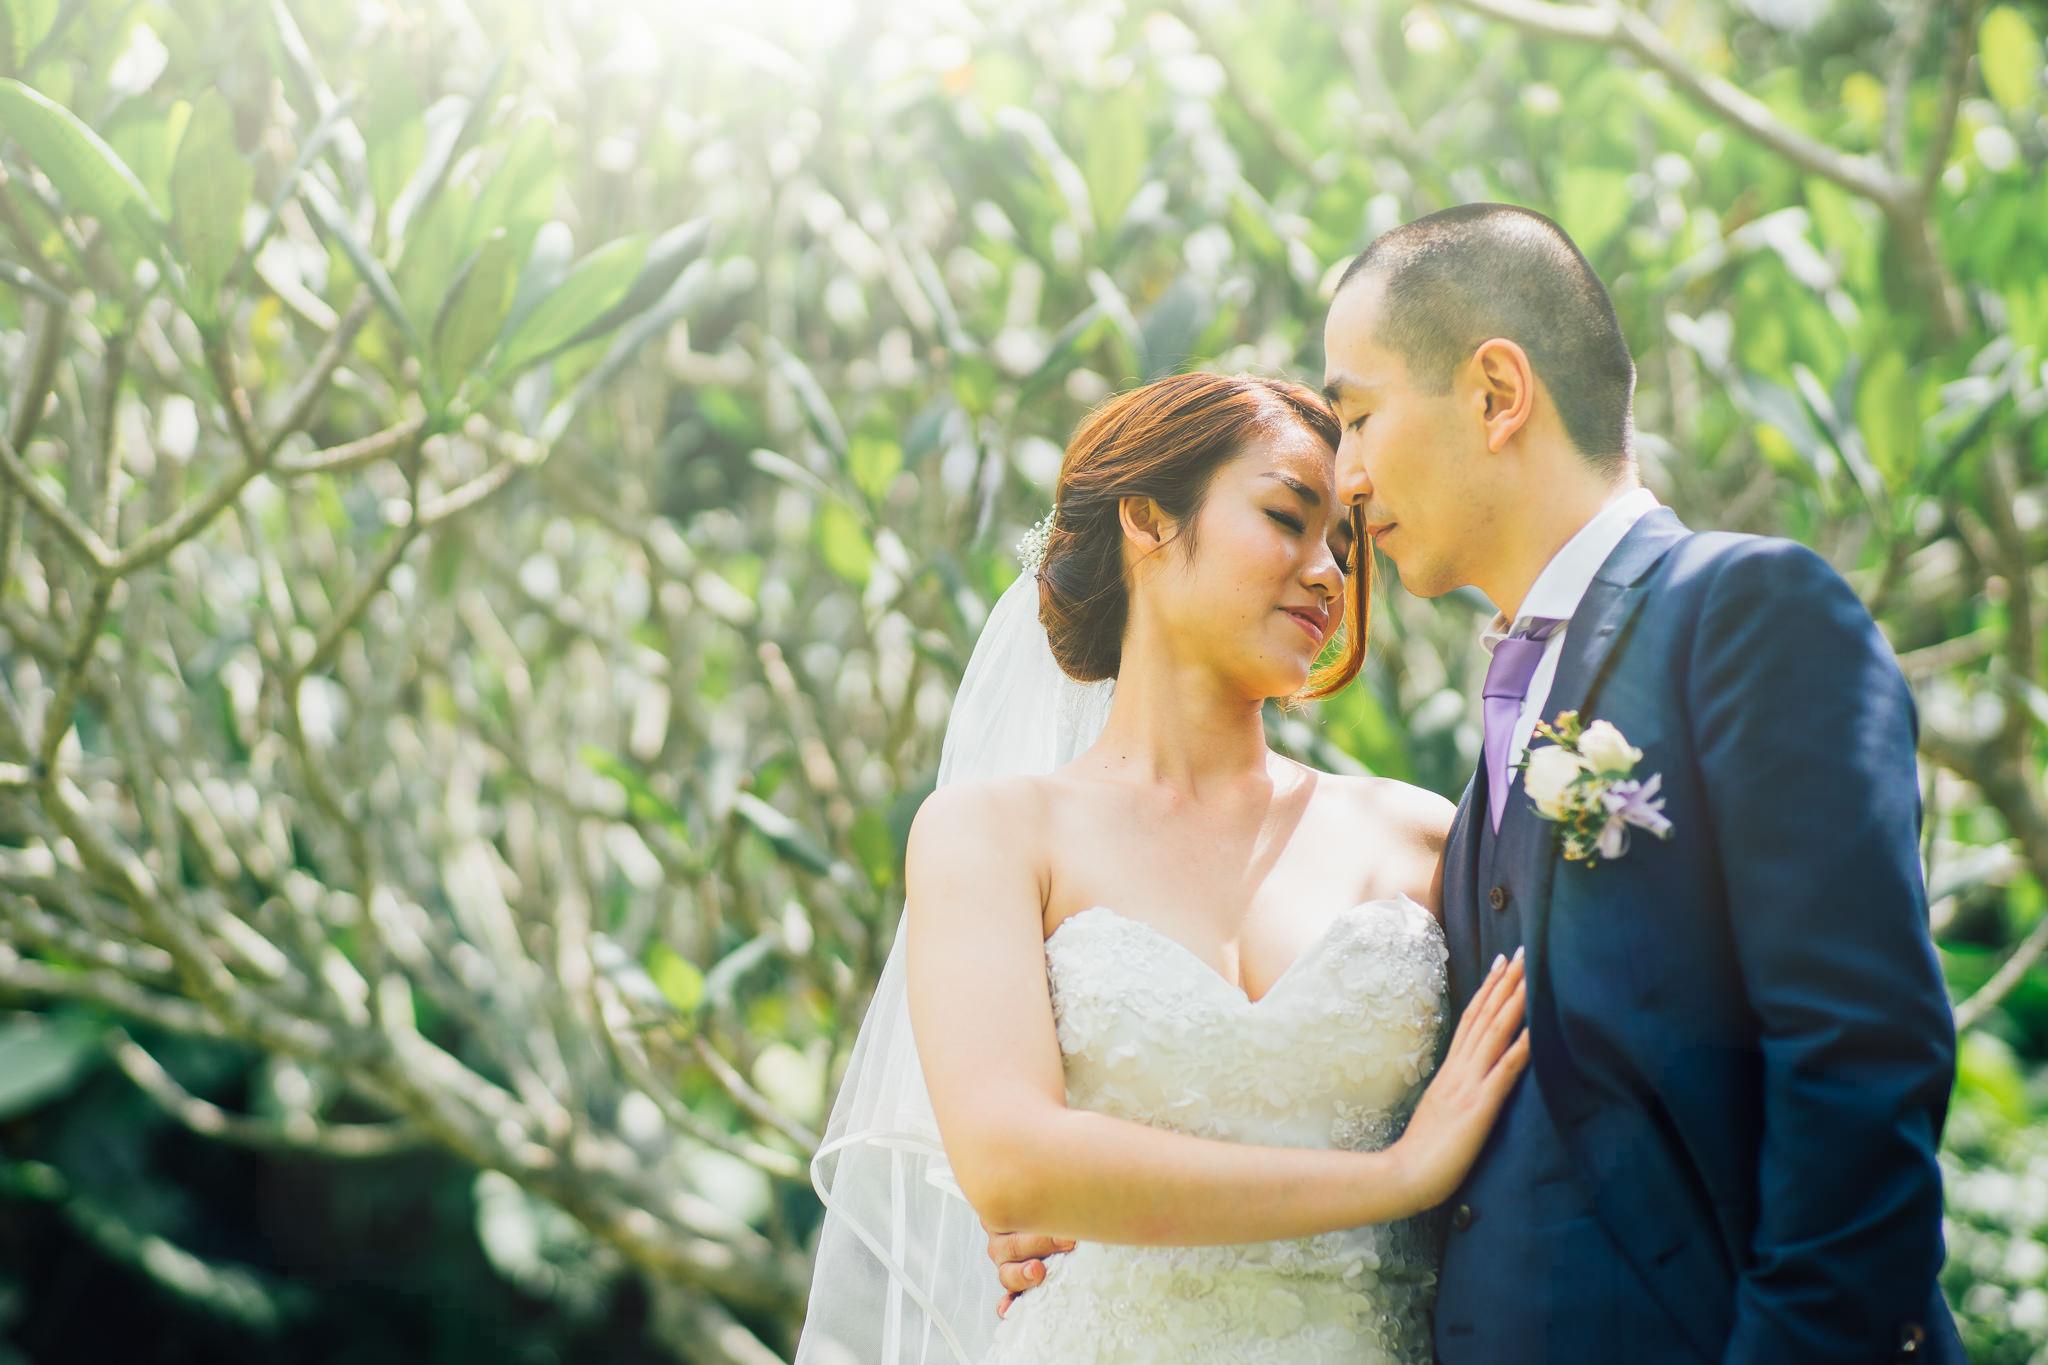 Singapore Wedding Photographer Garden asia shamrock chapel actual day wedding coverage (107 of 110).JPG